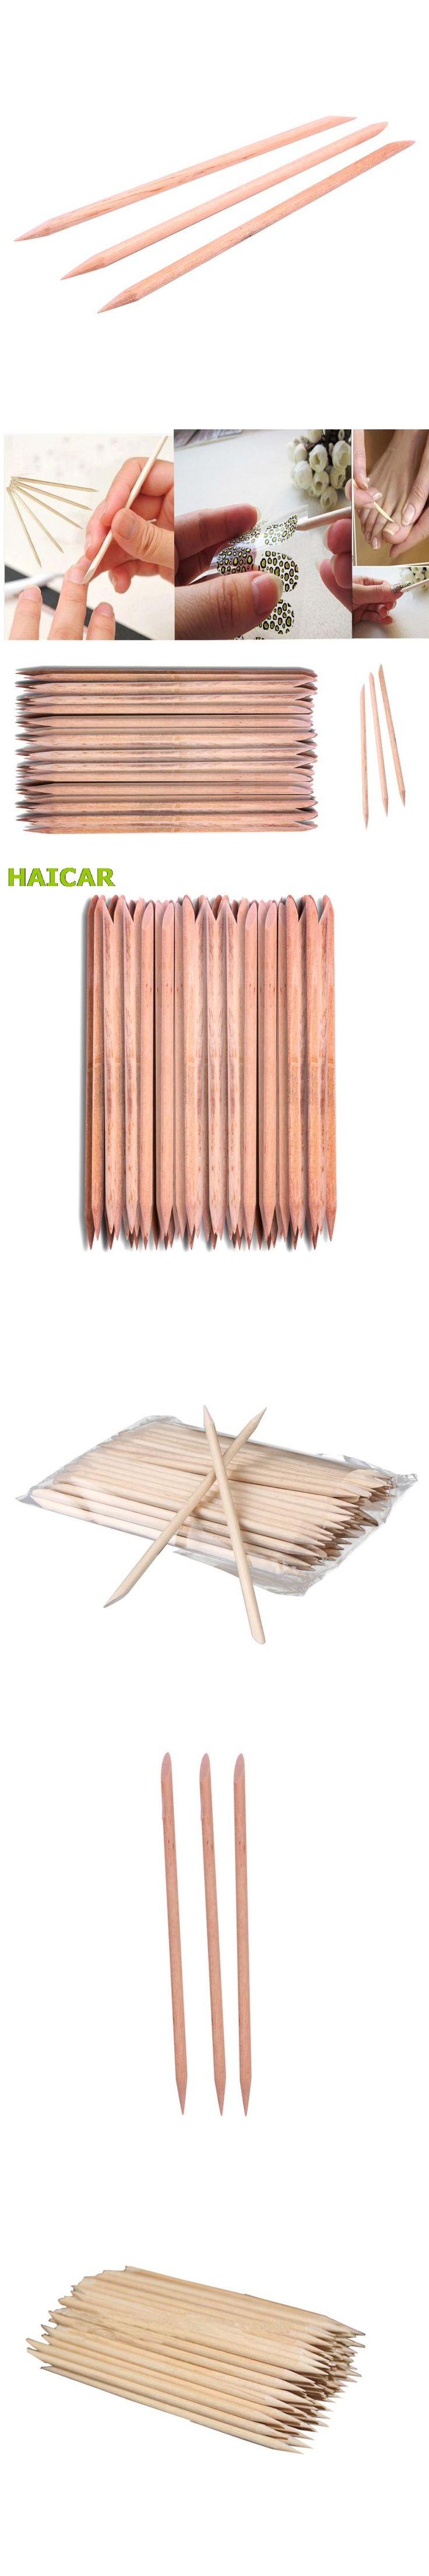 100Pcs Nail Art Orange Wood Stick Cuticle Pusher Remover Pedicure Manicure Tool 7.4CM For Women Beauty Dropship